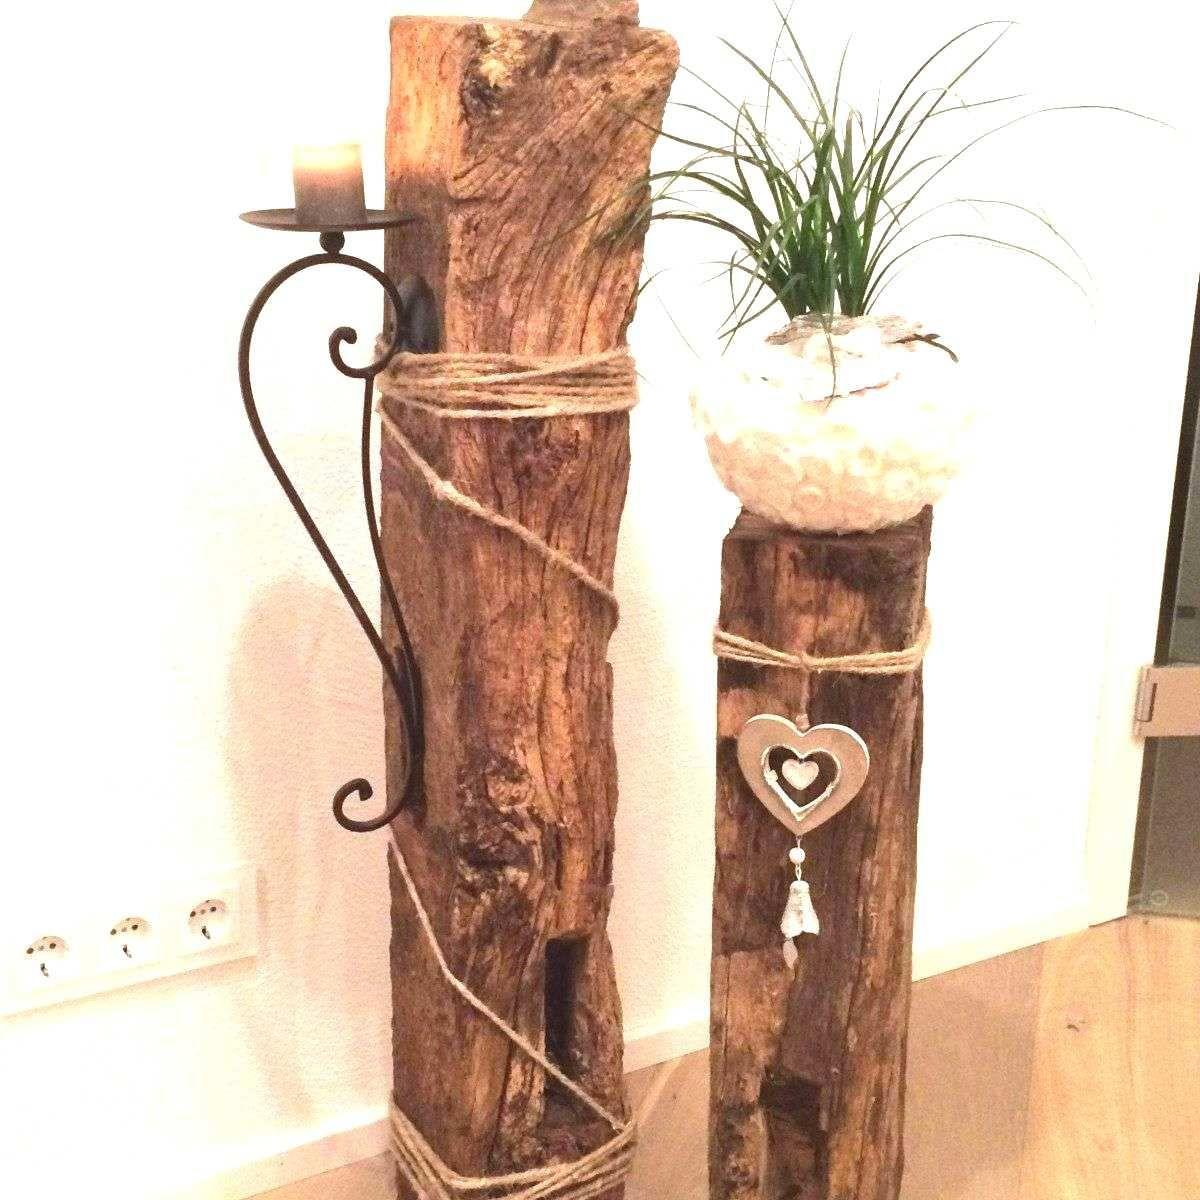 8 Genial Baumstumpf Deko Ideen in 8  Baumstamm deko, Selber